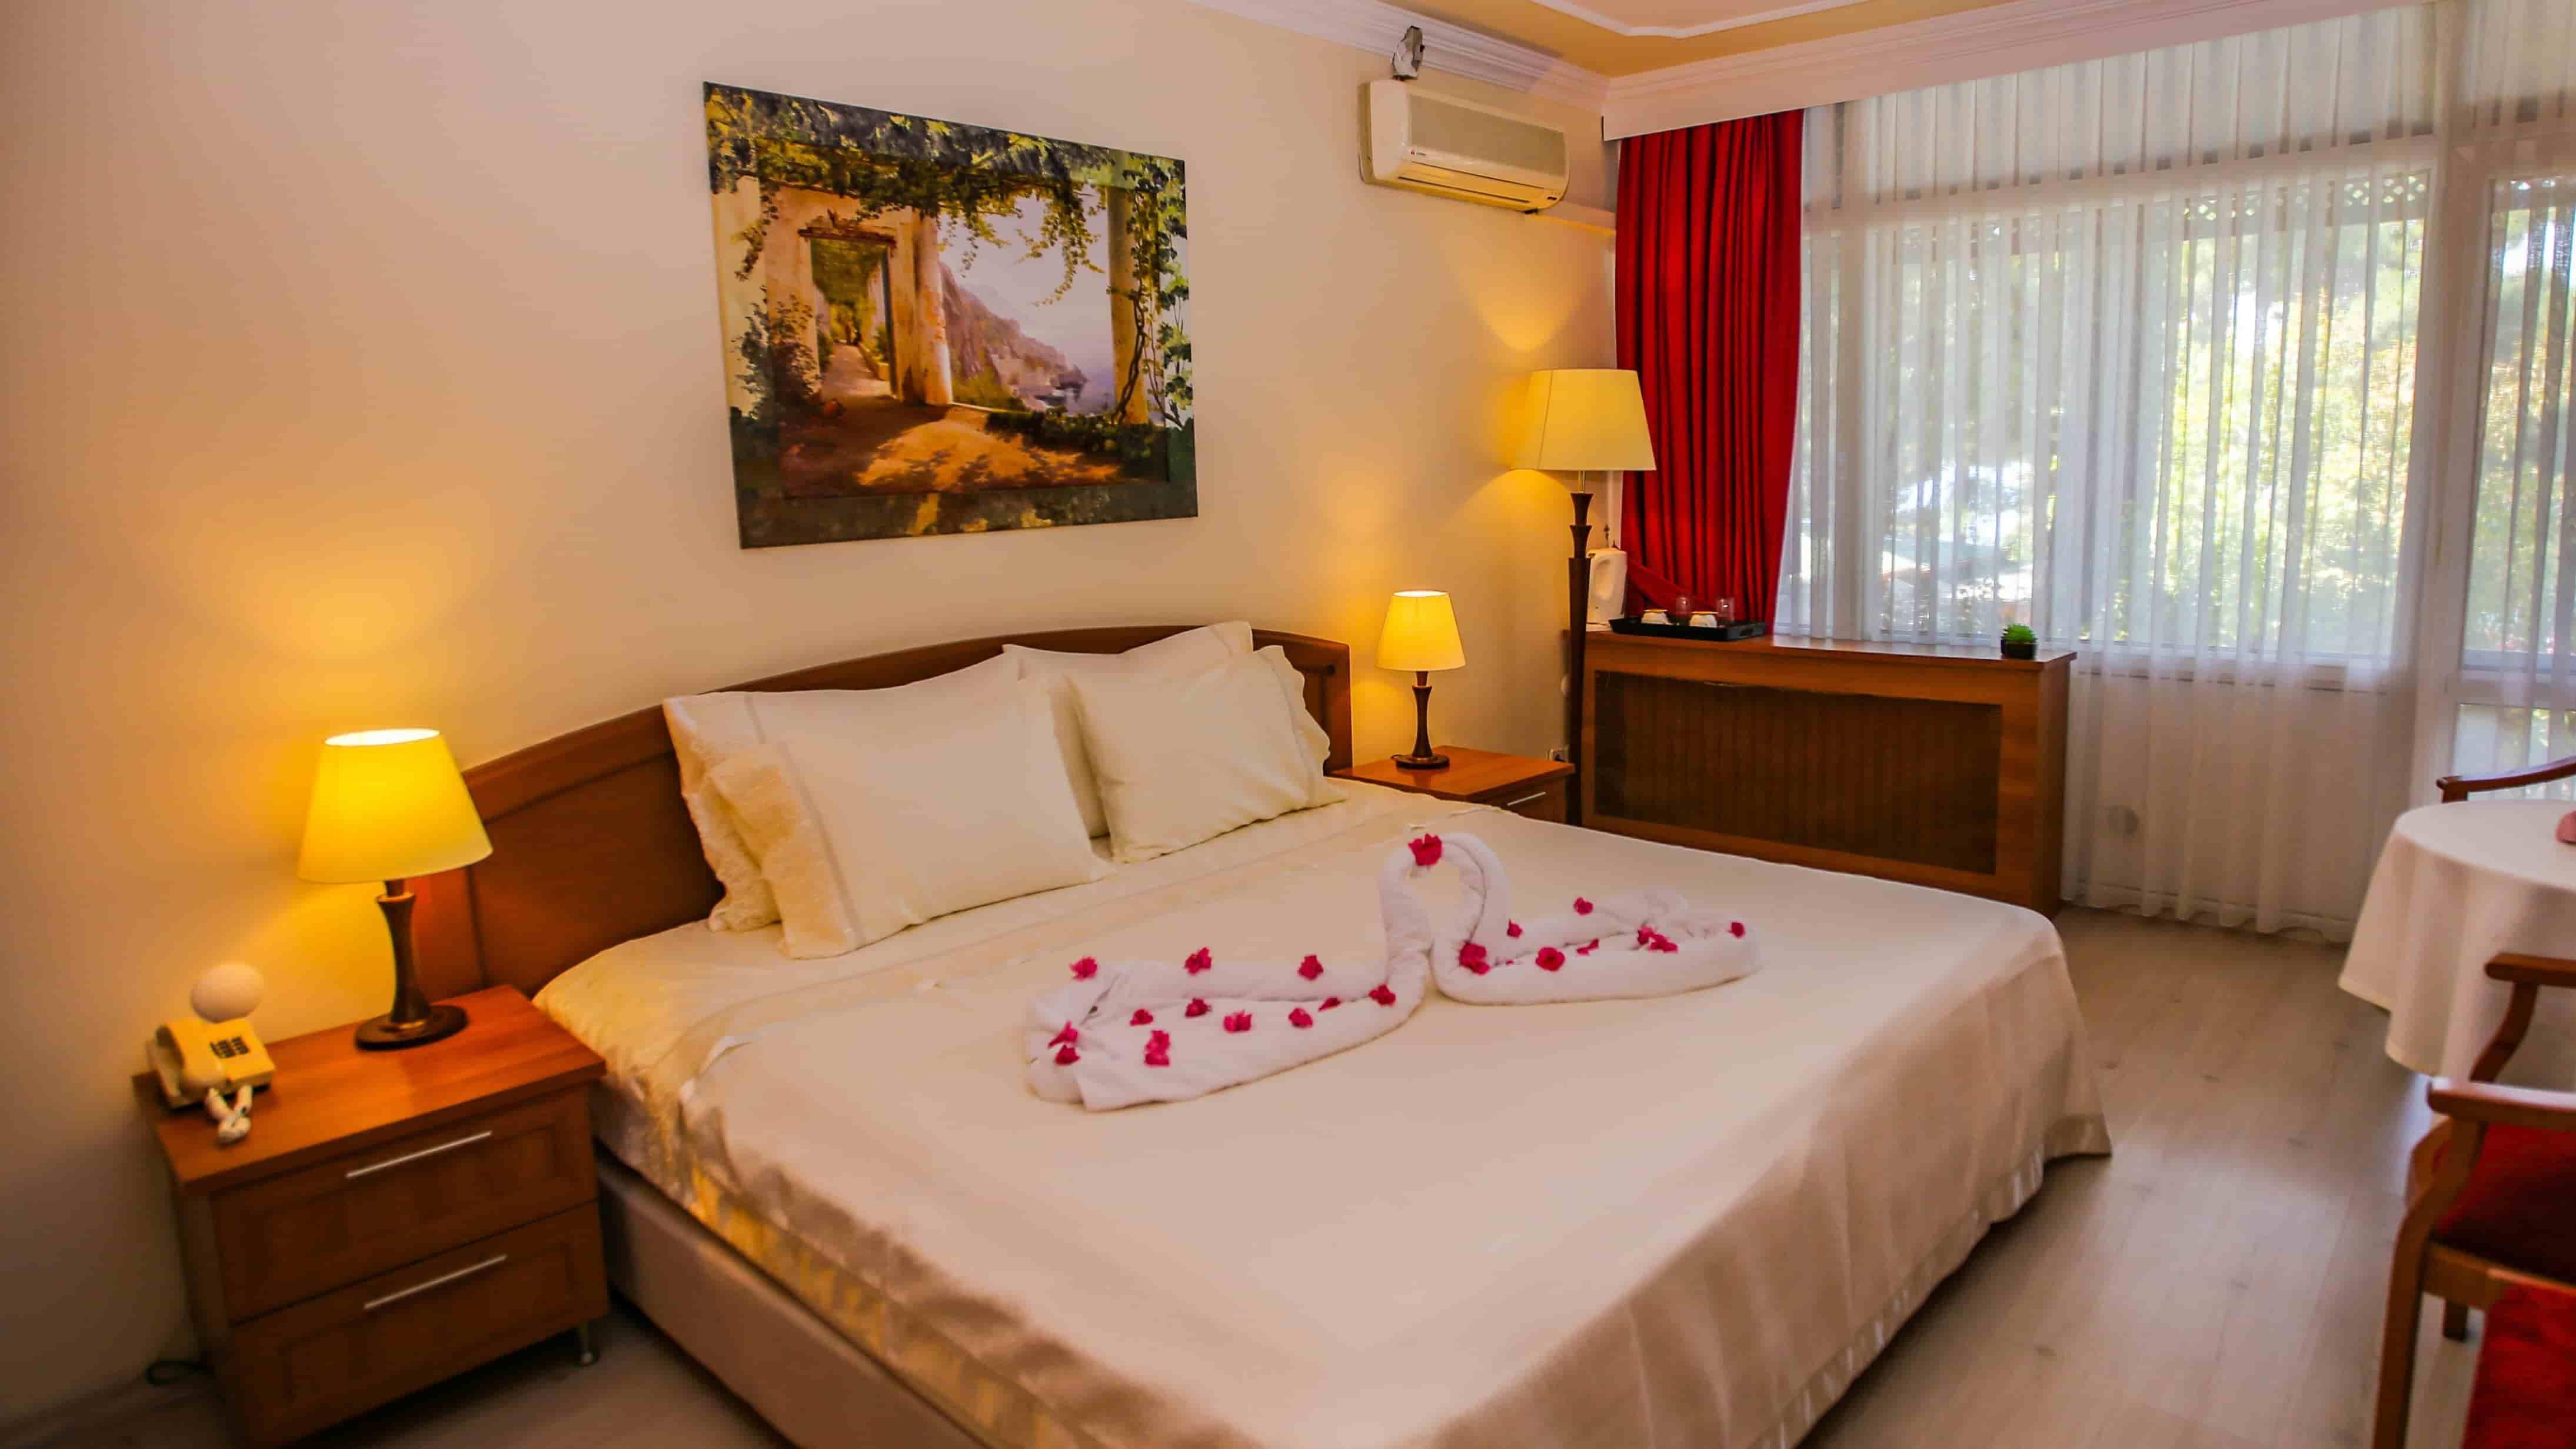 Letovanje Turska autobusom, Čanakkale, Hotel Troja Tusan, izgled sobe